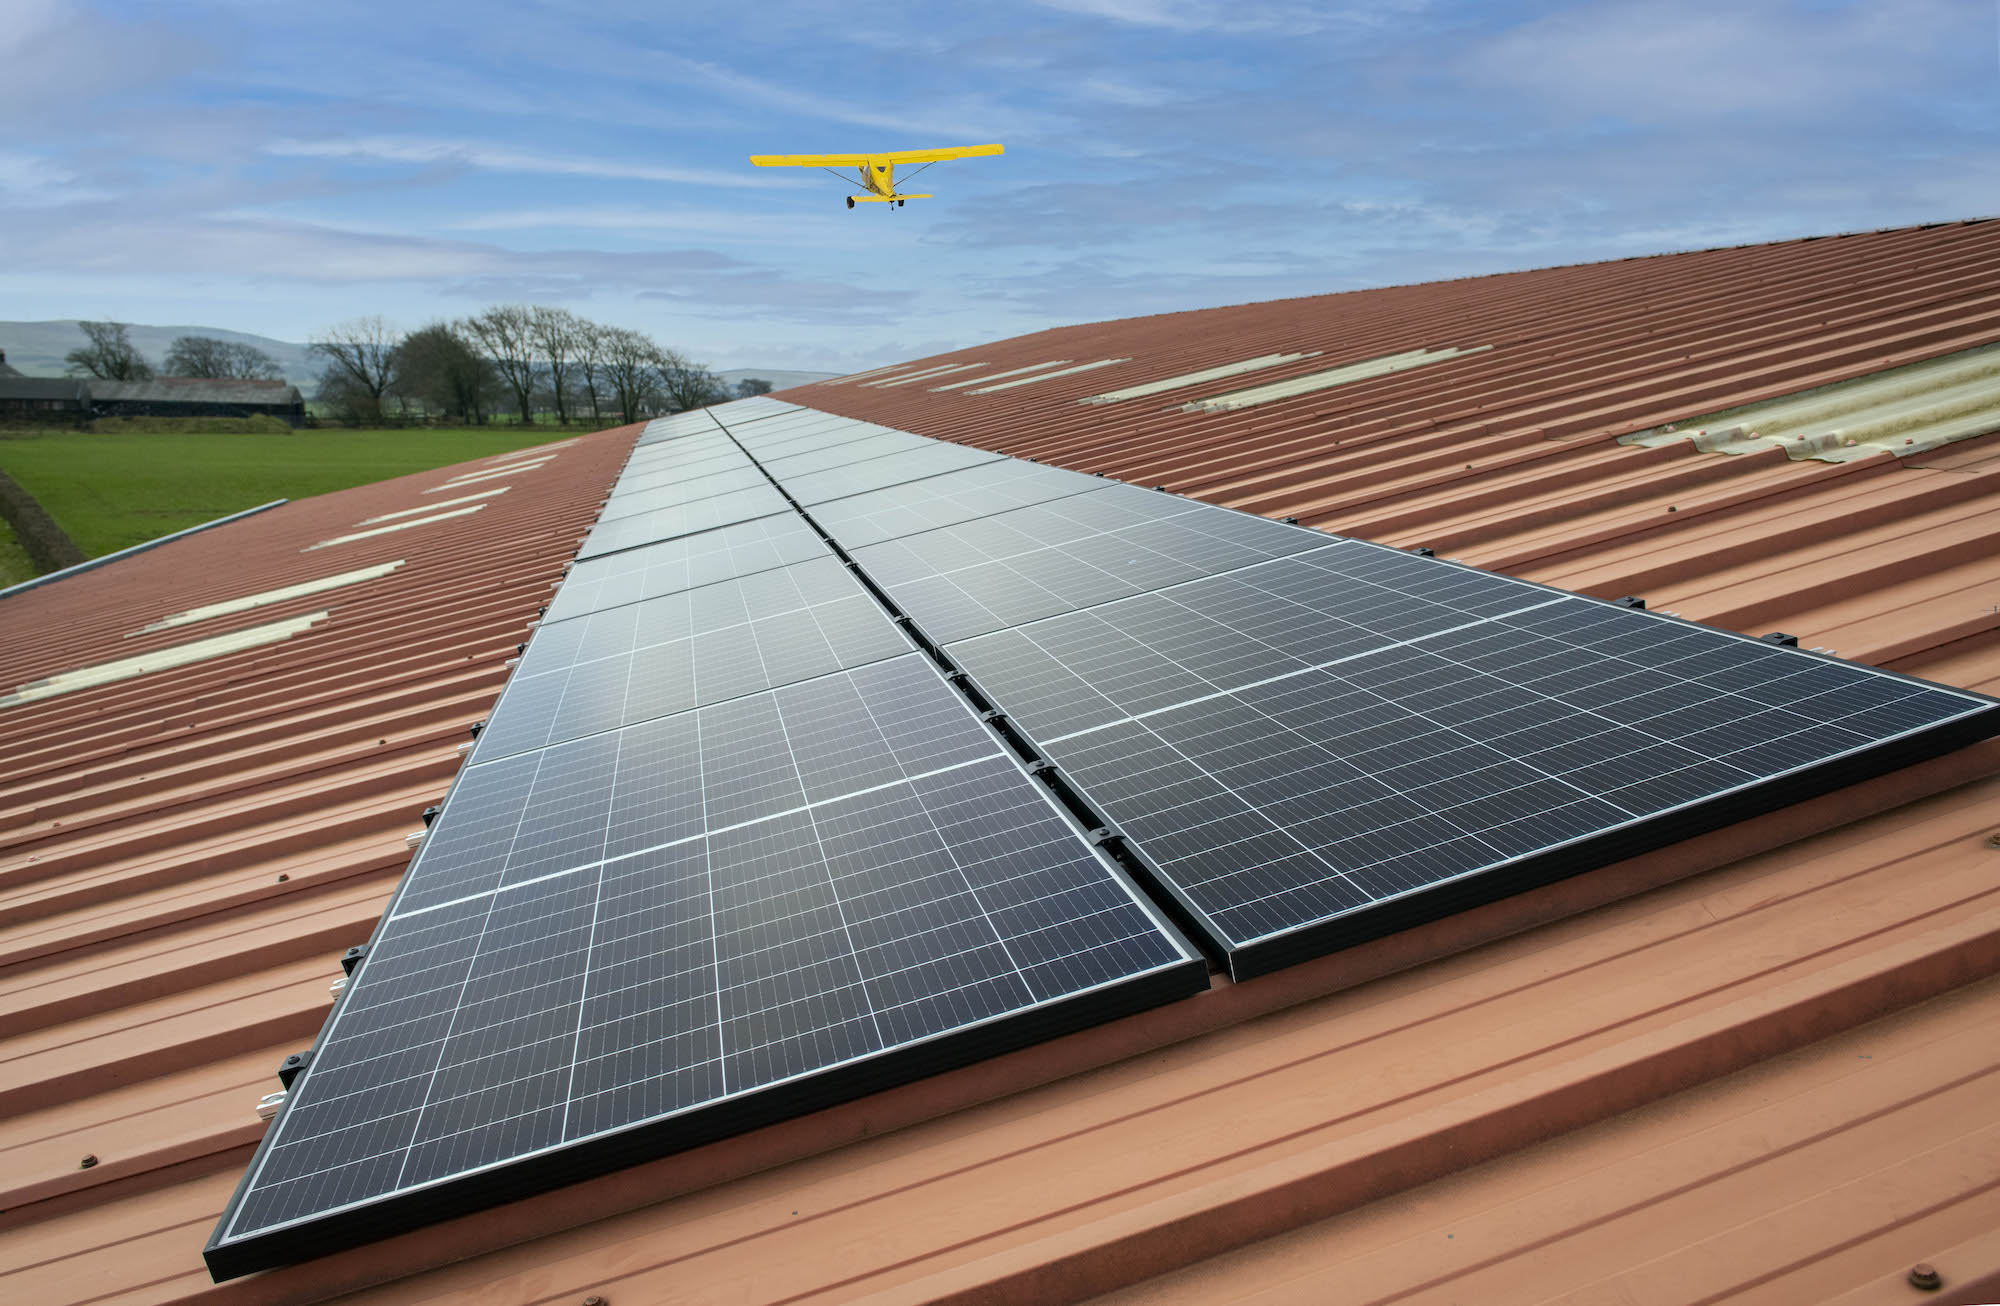 Strathaven Airfield solar energy